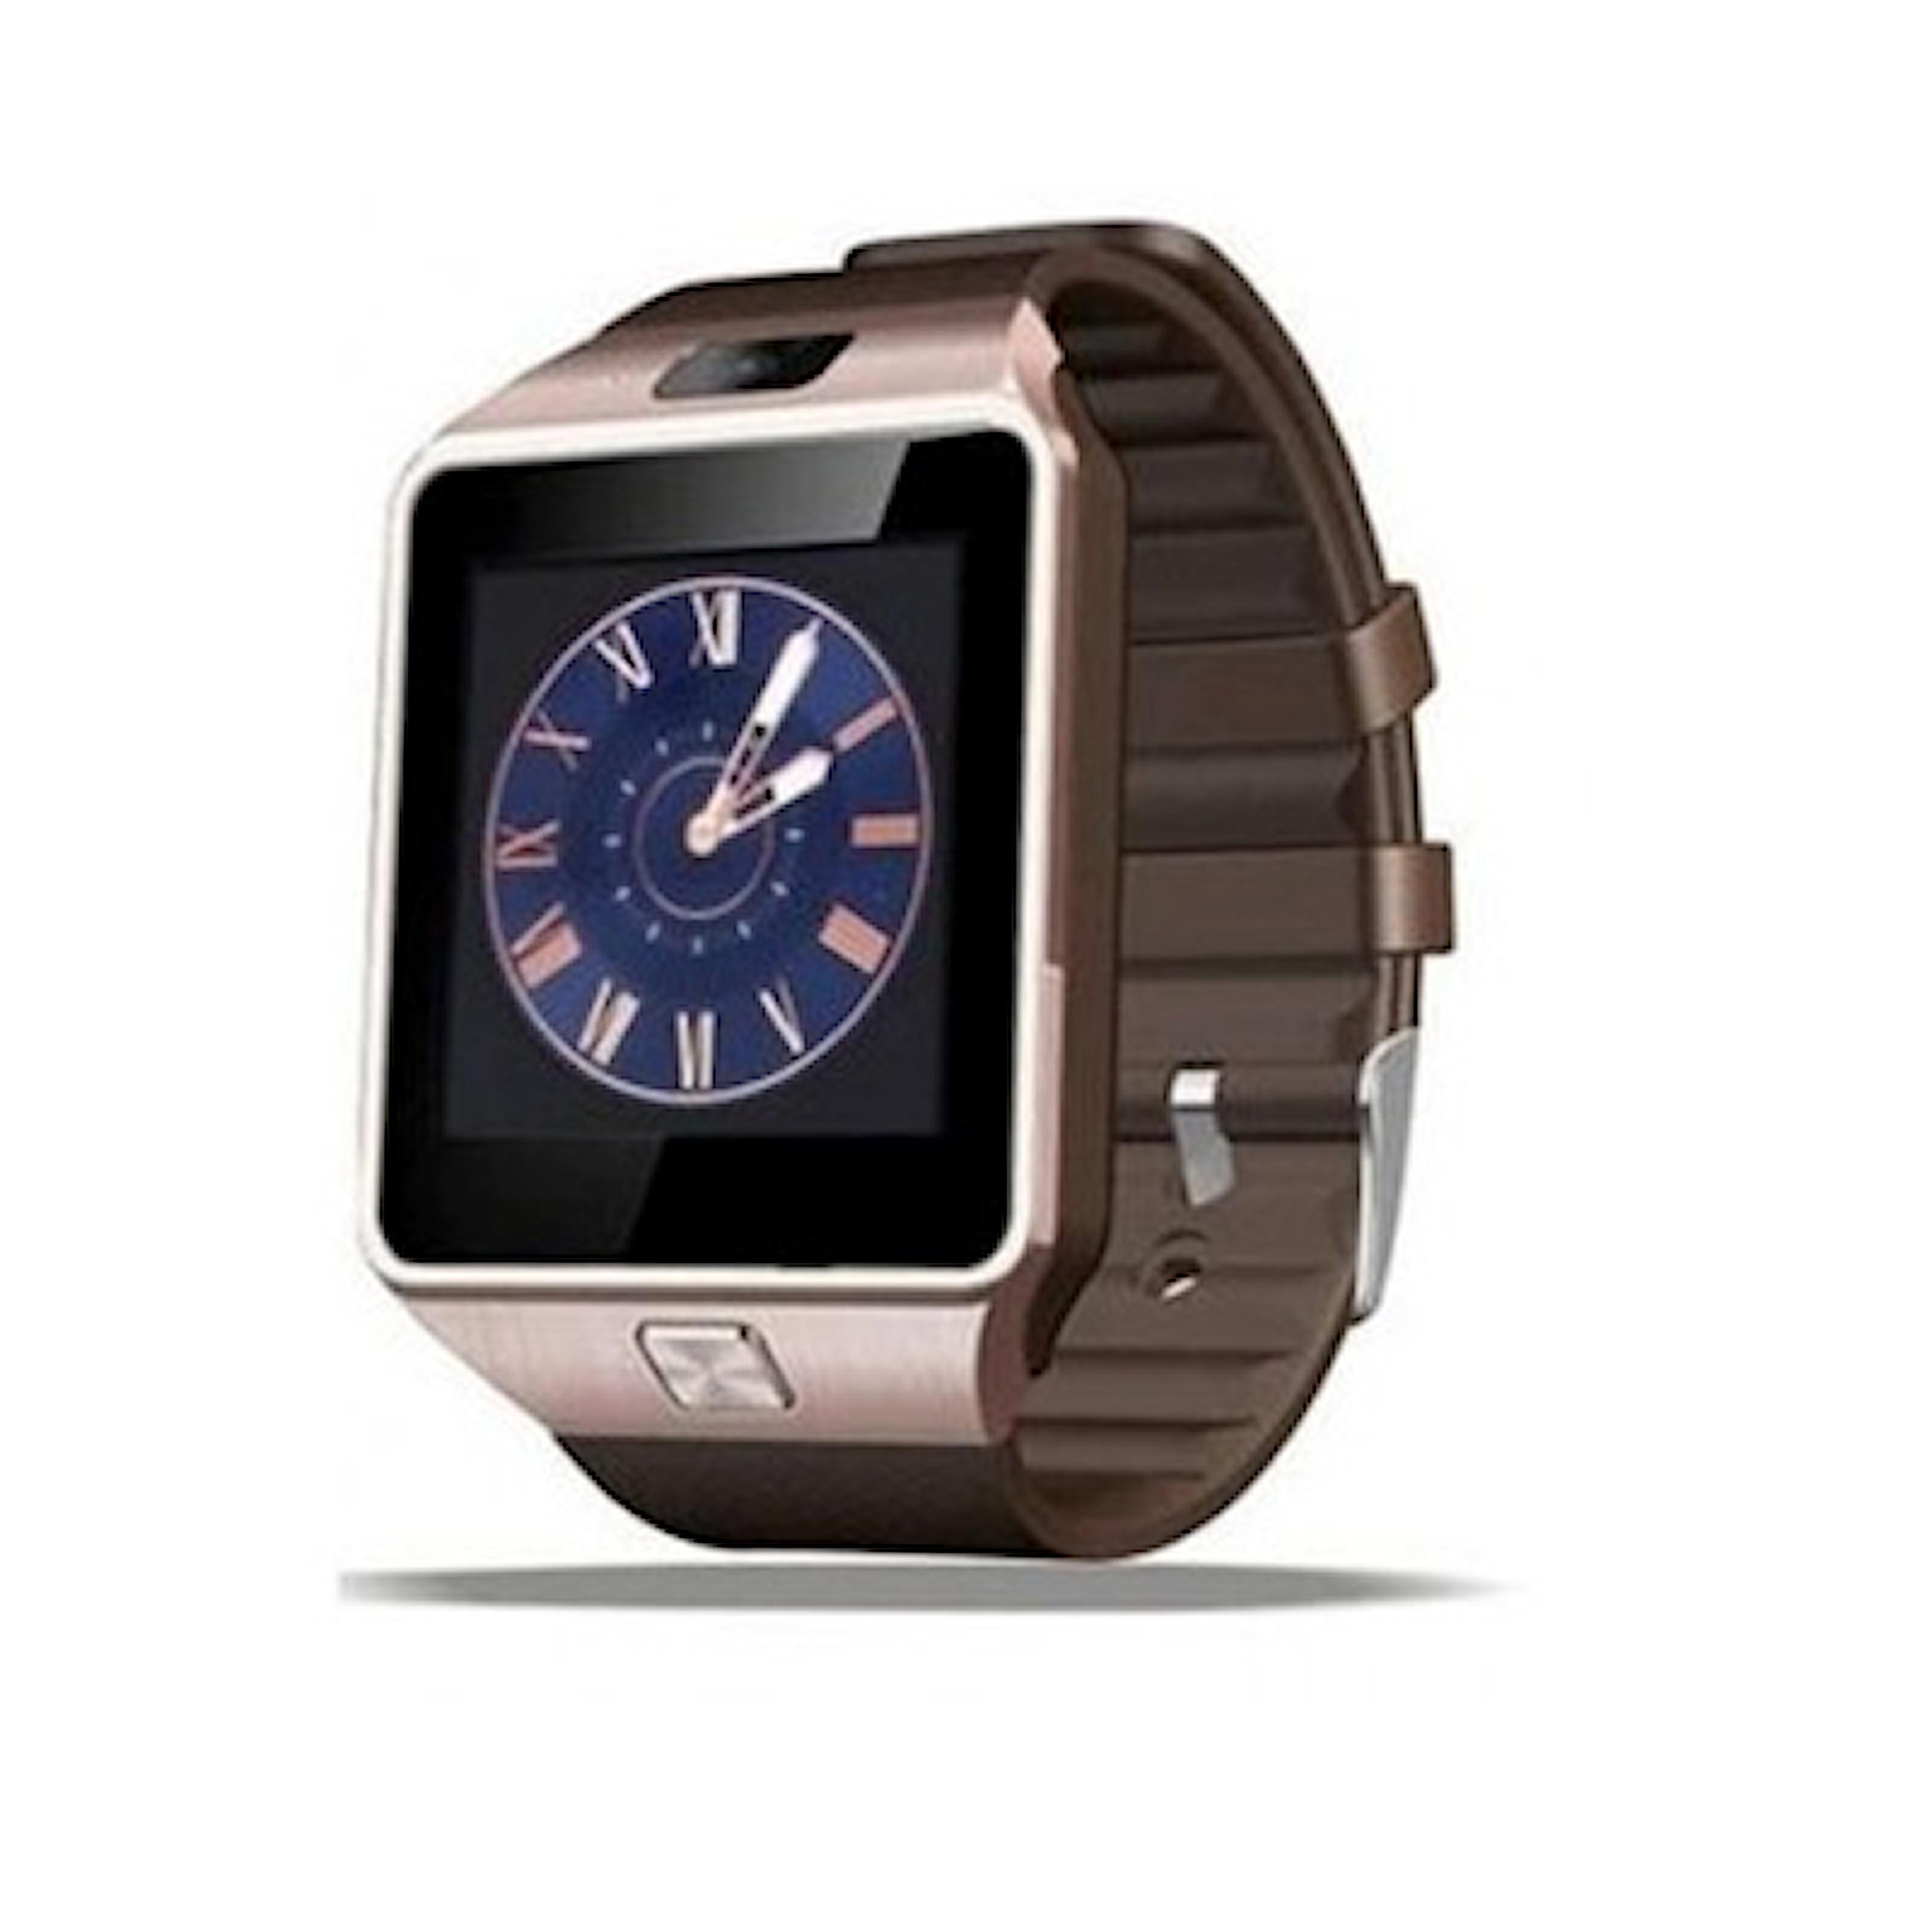 Guld/Brun, SMART Bluetooth Watch, 3 colors, Smartwatch, ,